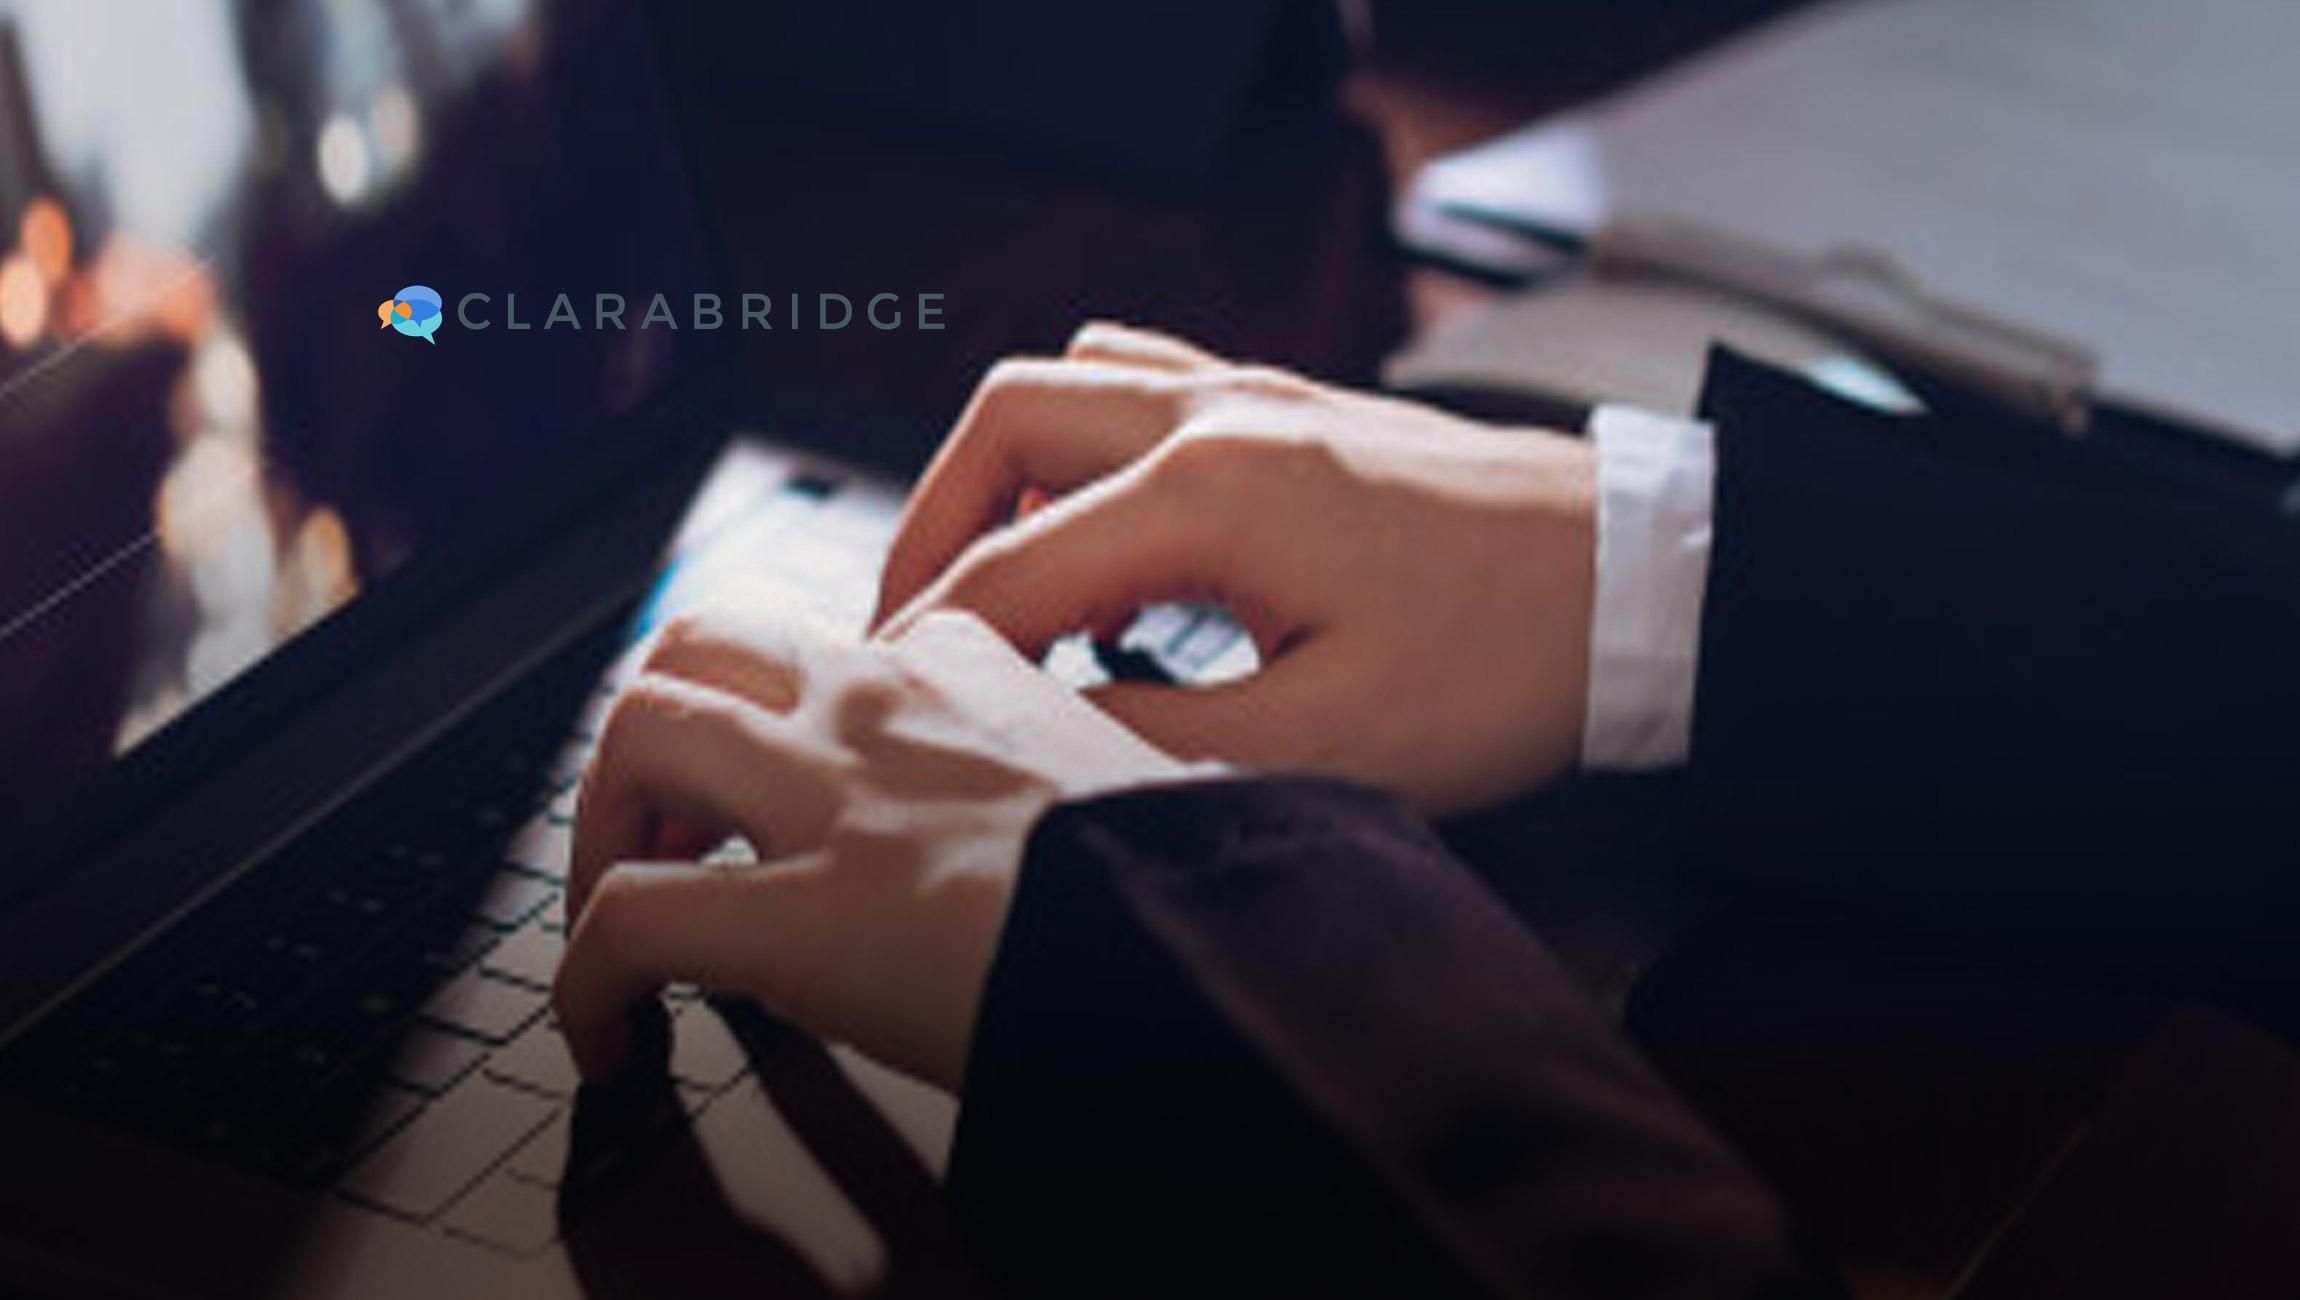 Clarabridge Launches Groundbreaking AI-Augmented Quality Management Solution